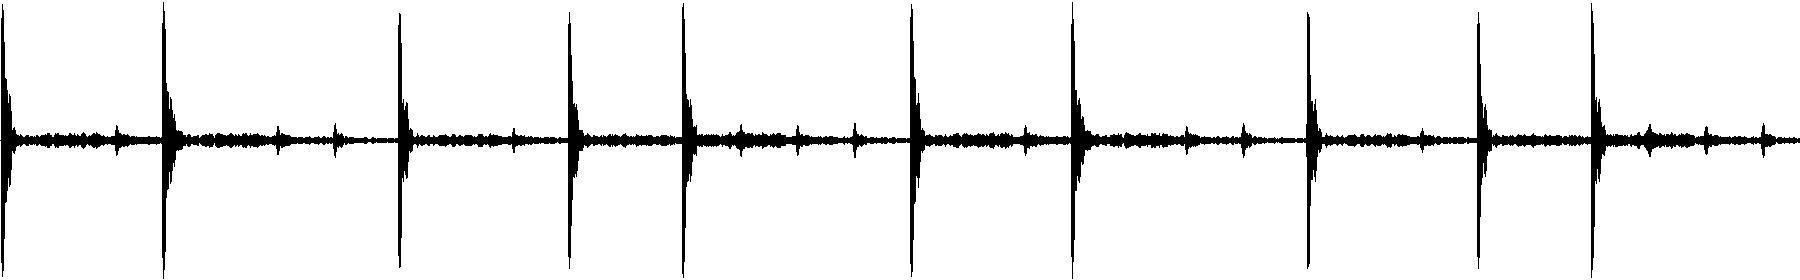 shg percussion loop 17